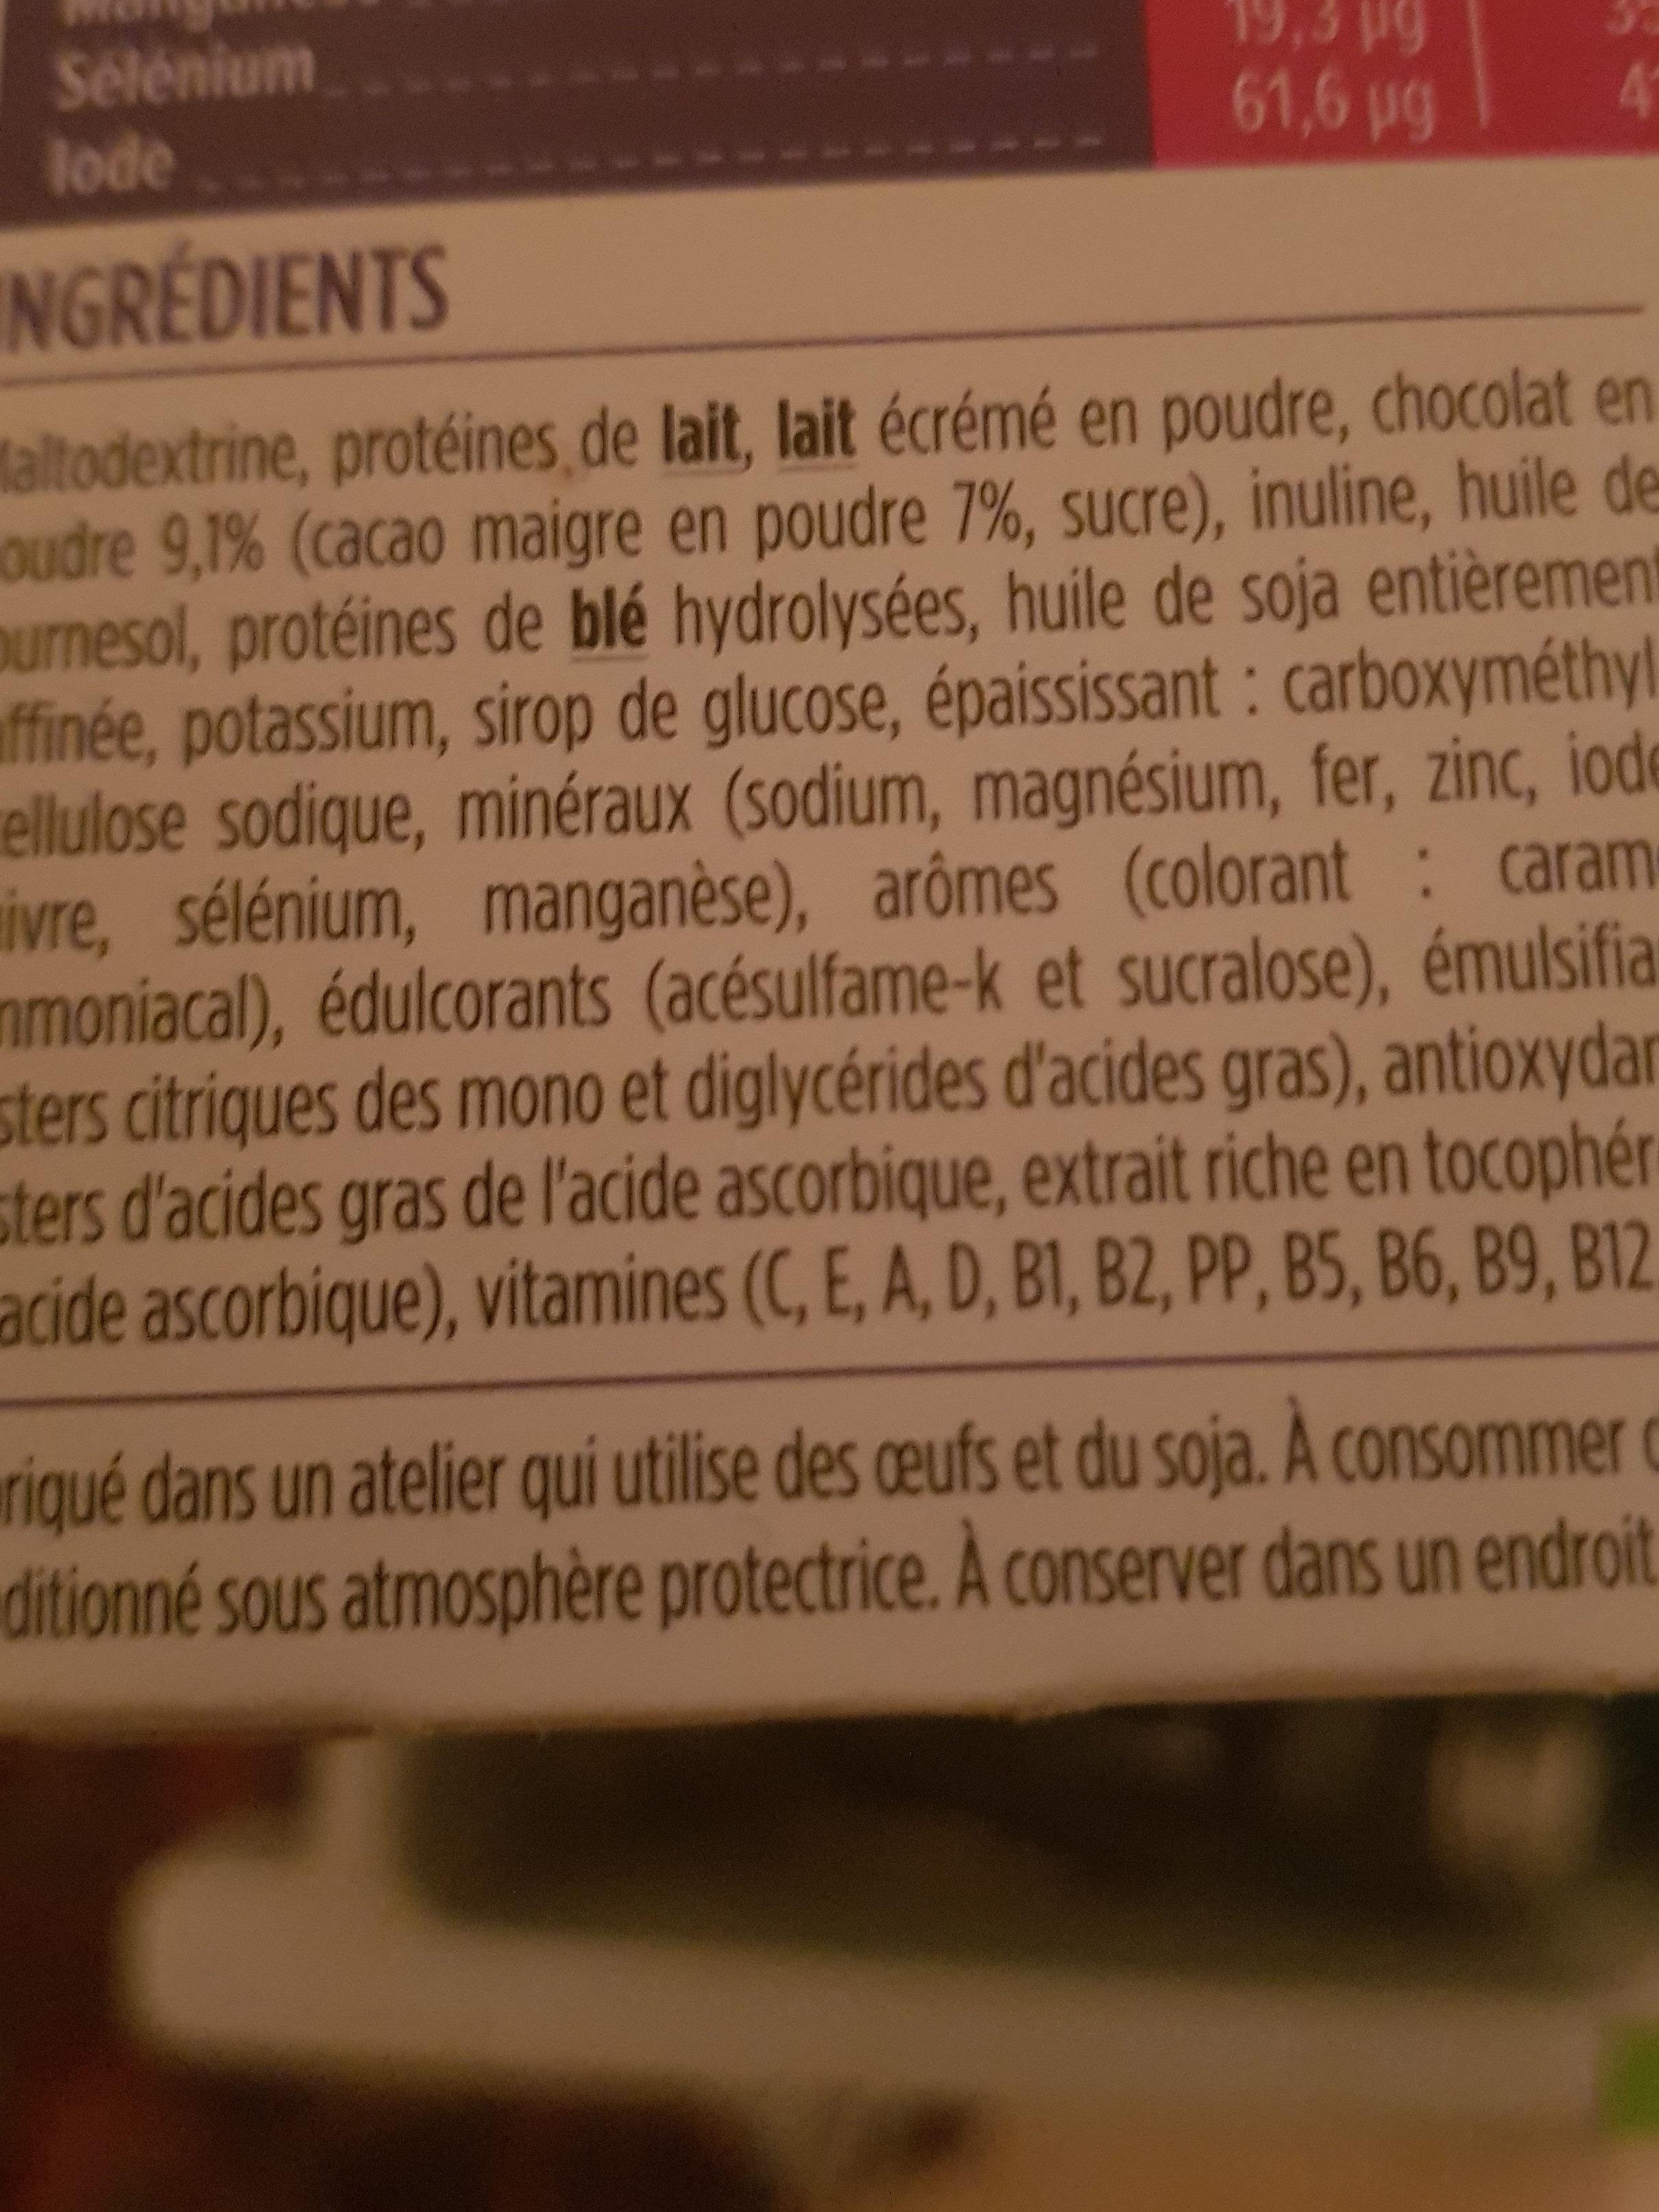 milk-shake au chocolat - Ingrédients